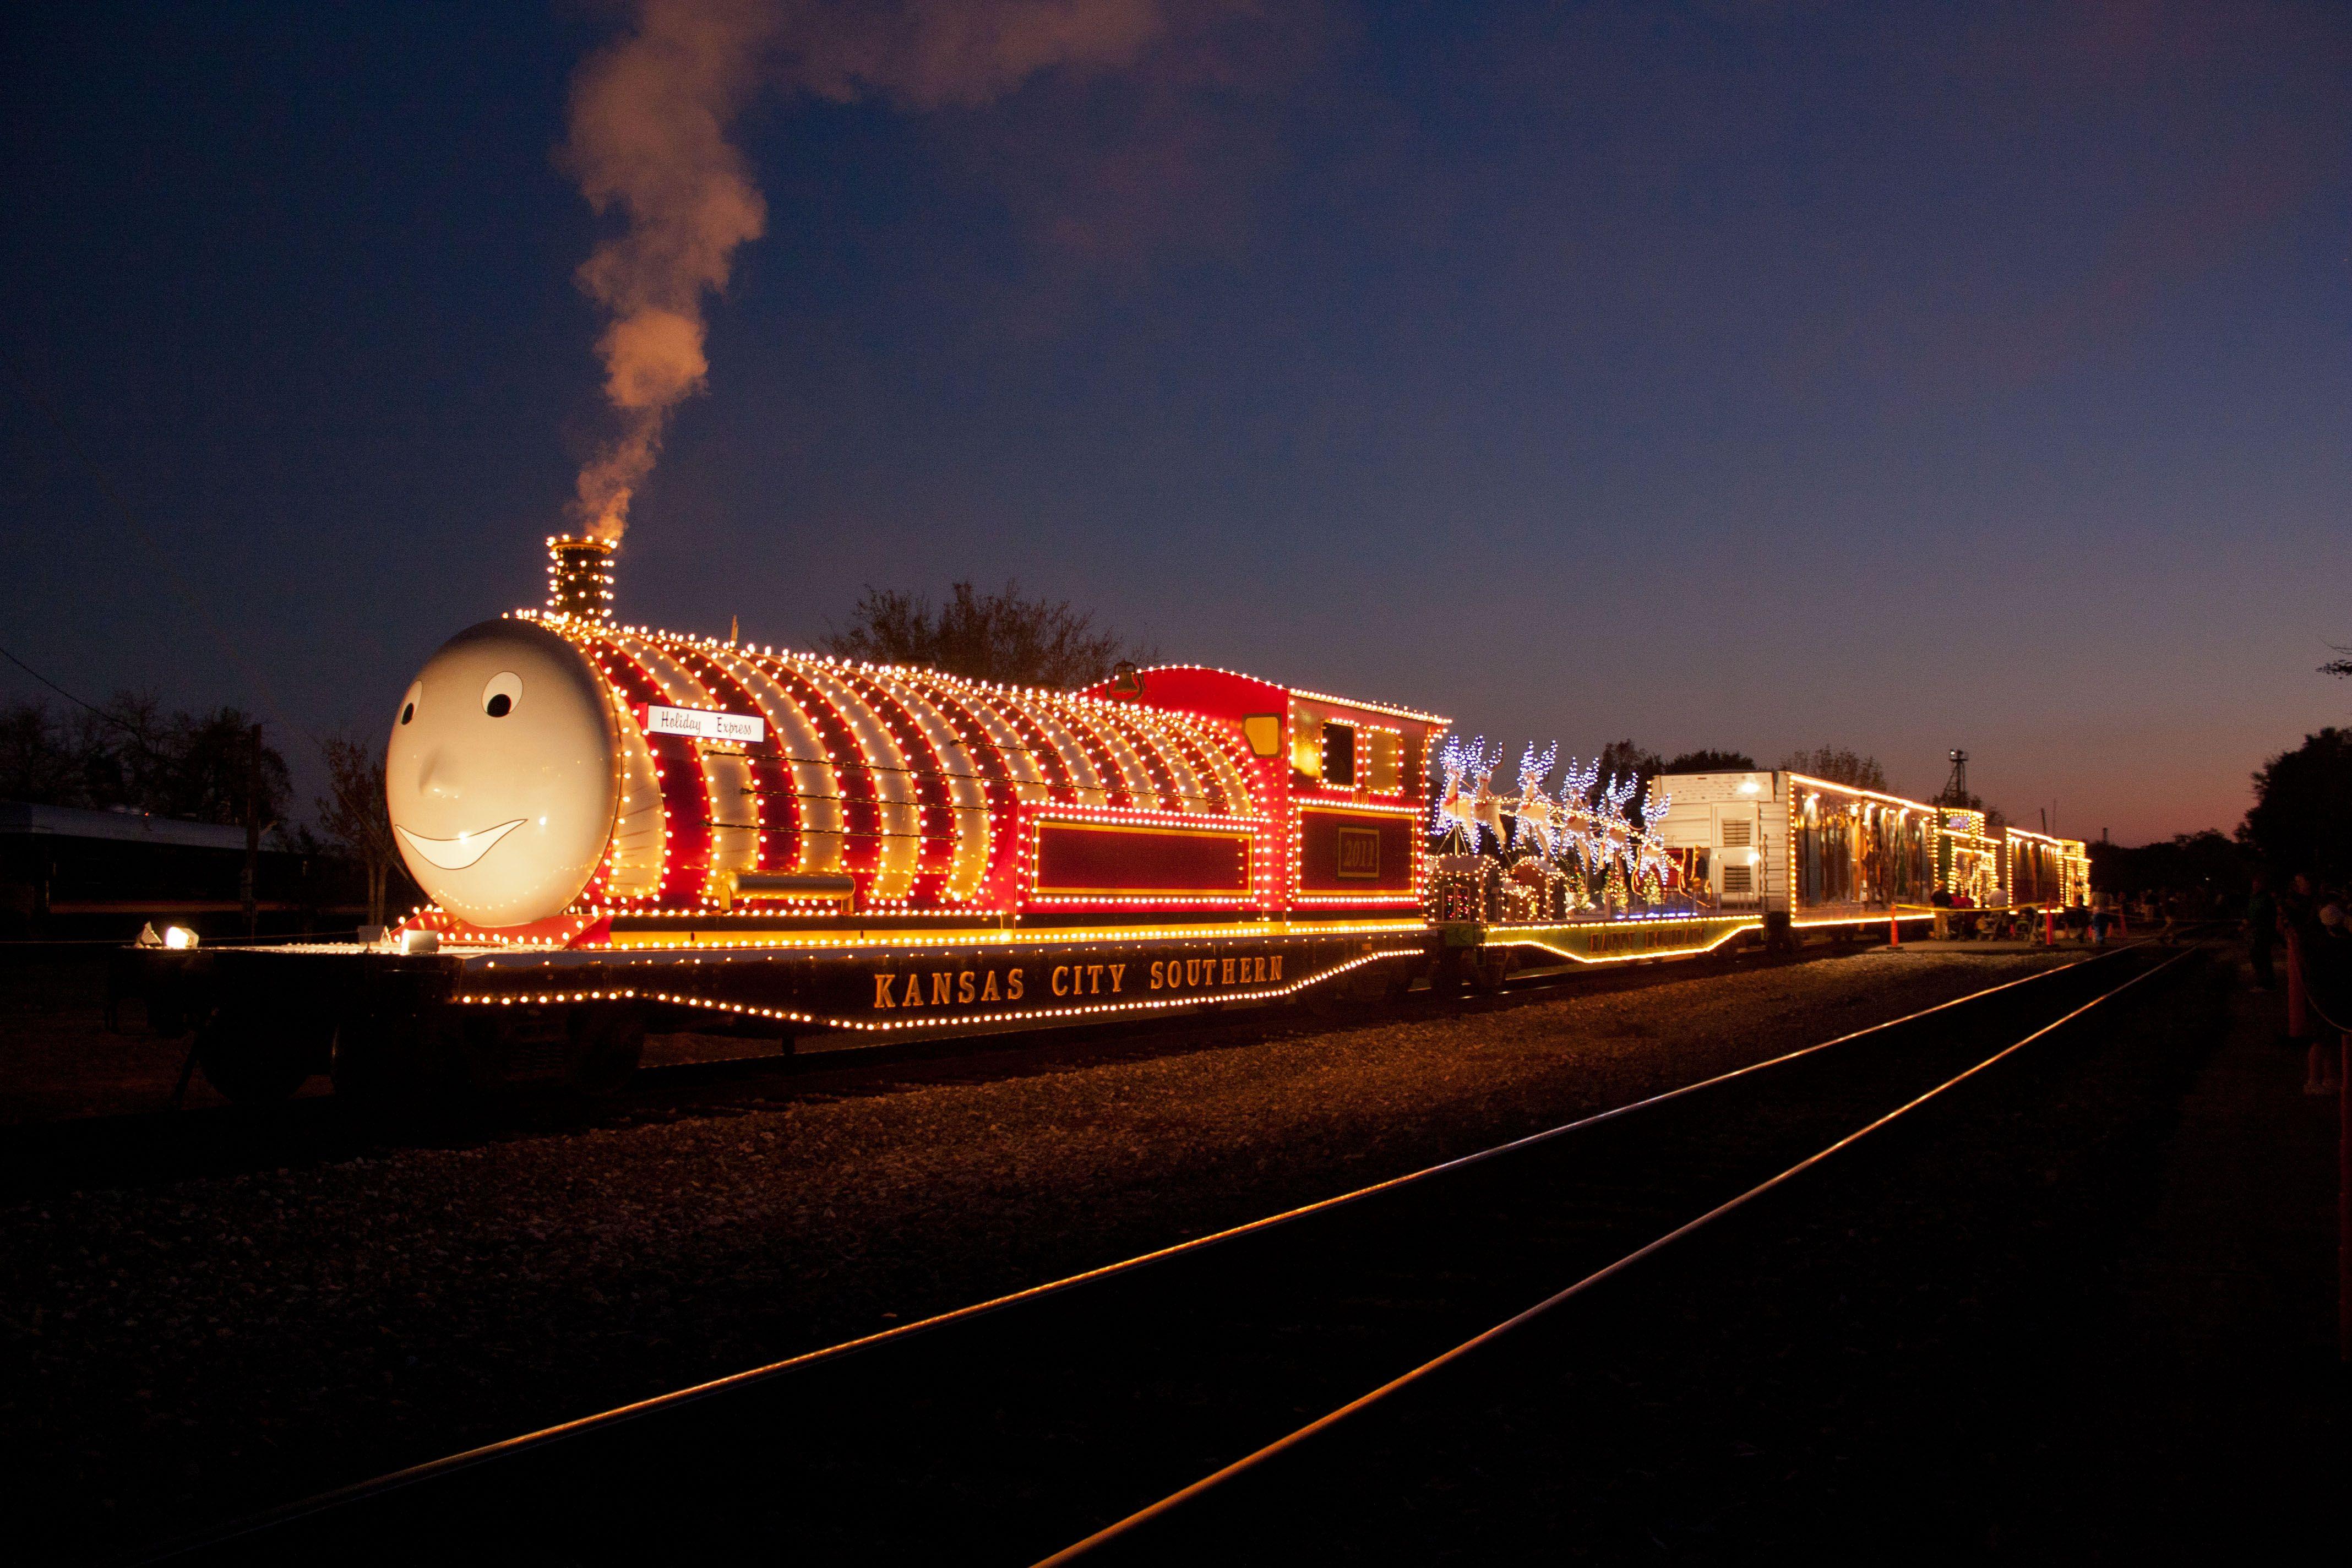 Kansas City Southern Christmas Train 2020 Kansas City Southern Holiday Express Train | Holiday express train